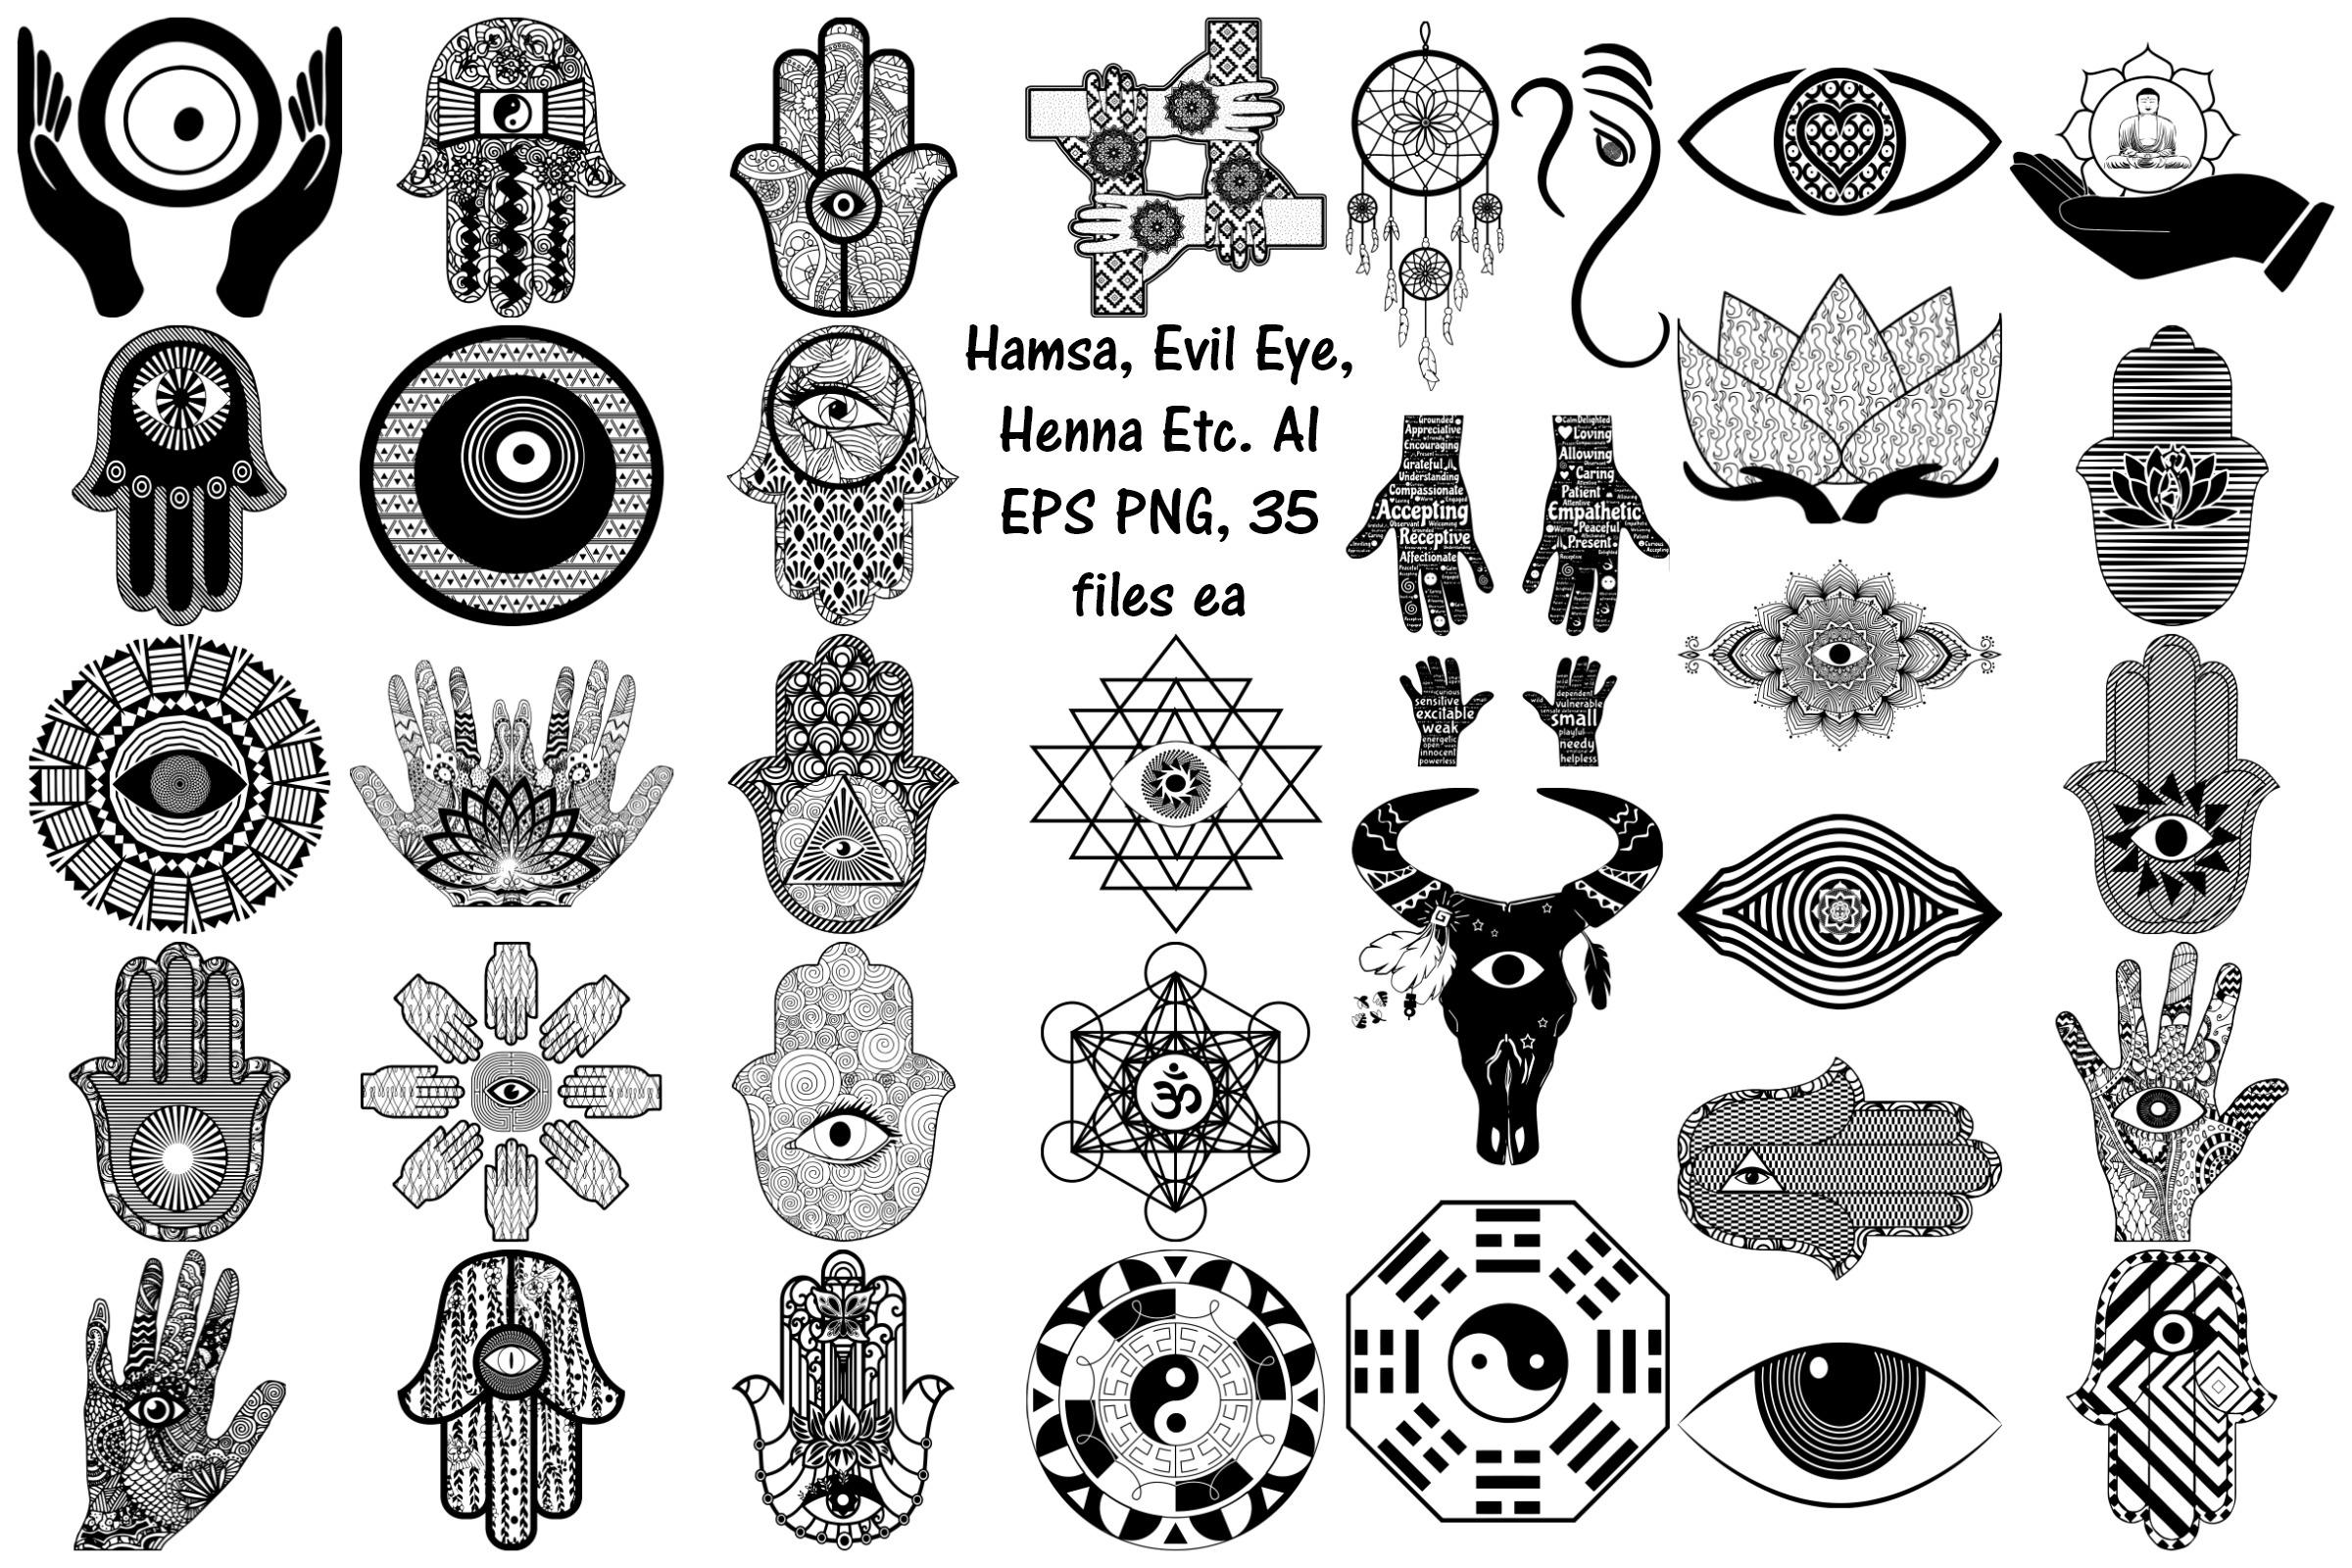 Hamsa Evil Eye Henna Etc Ai Eps Png Clip Art